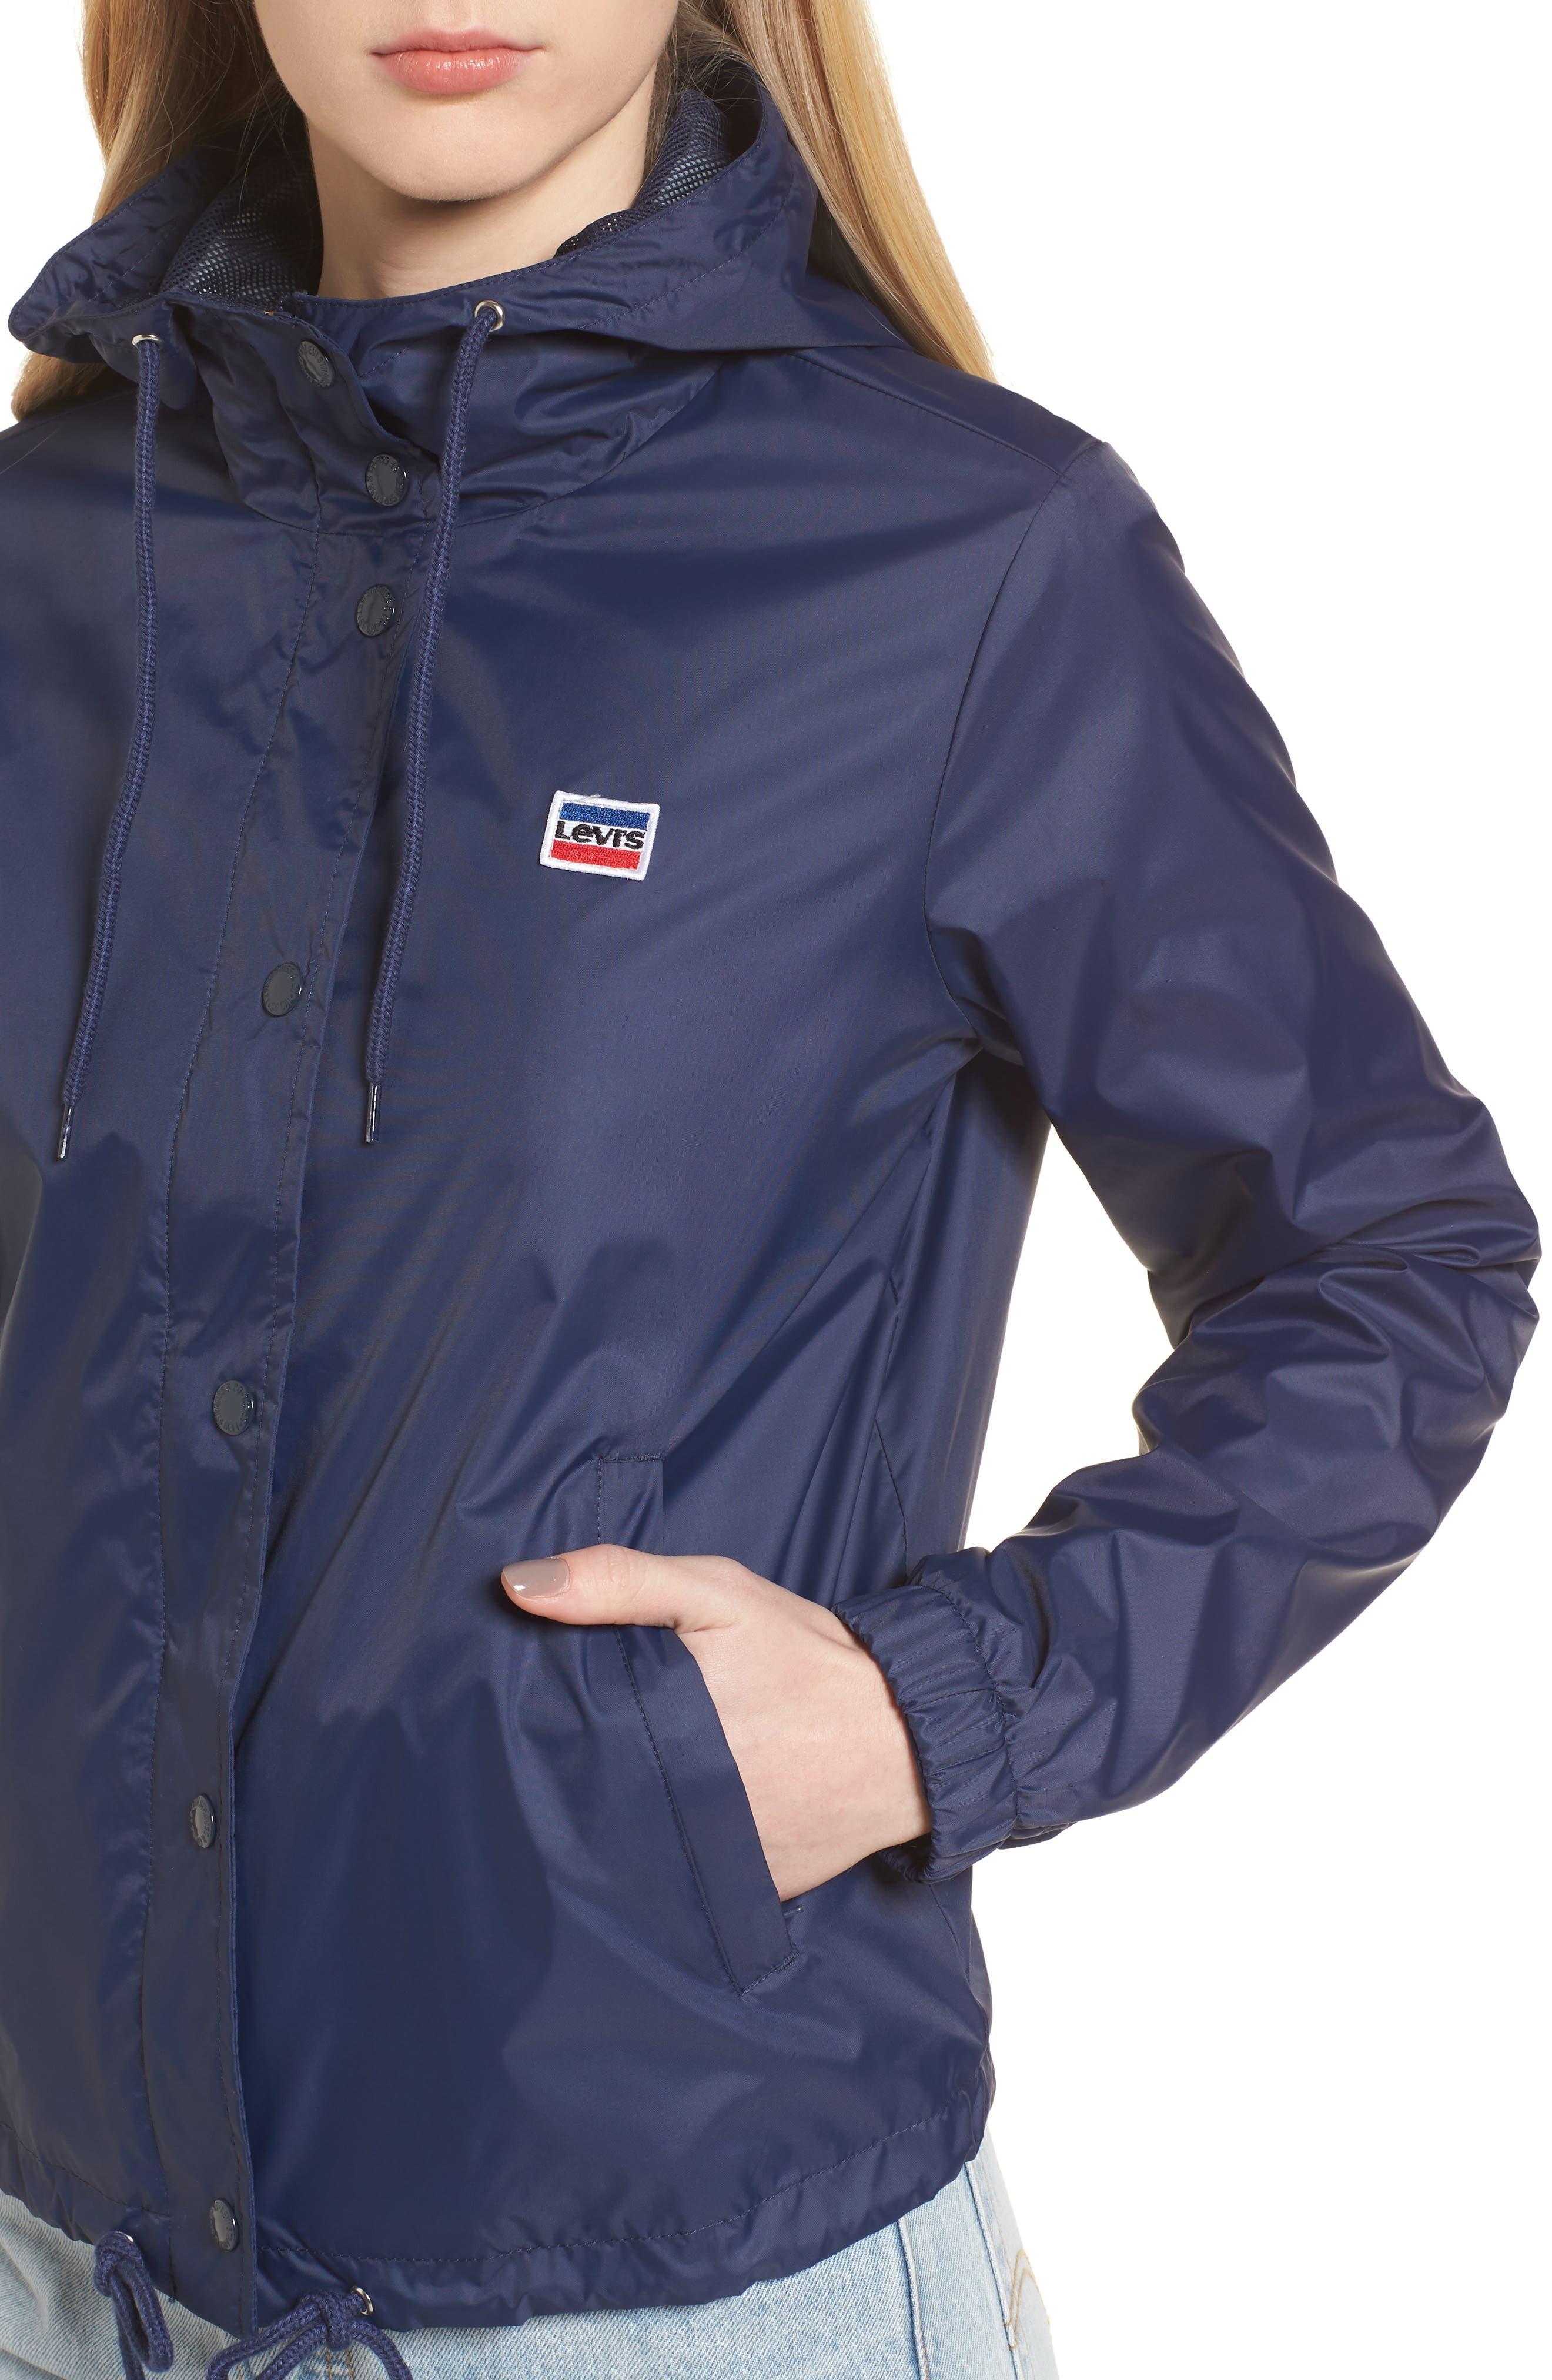 Retro Hooded Coach's Jacket,                             Alternate thumbnail 4, color,                             Navy